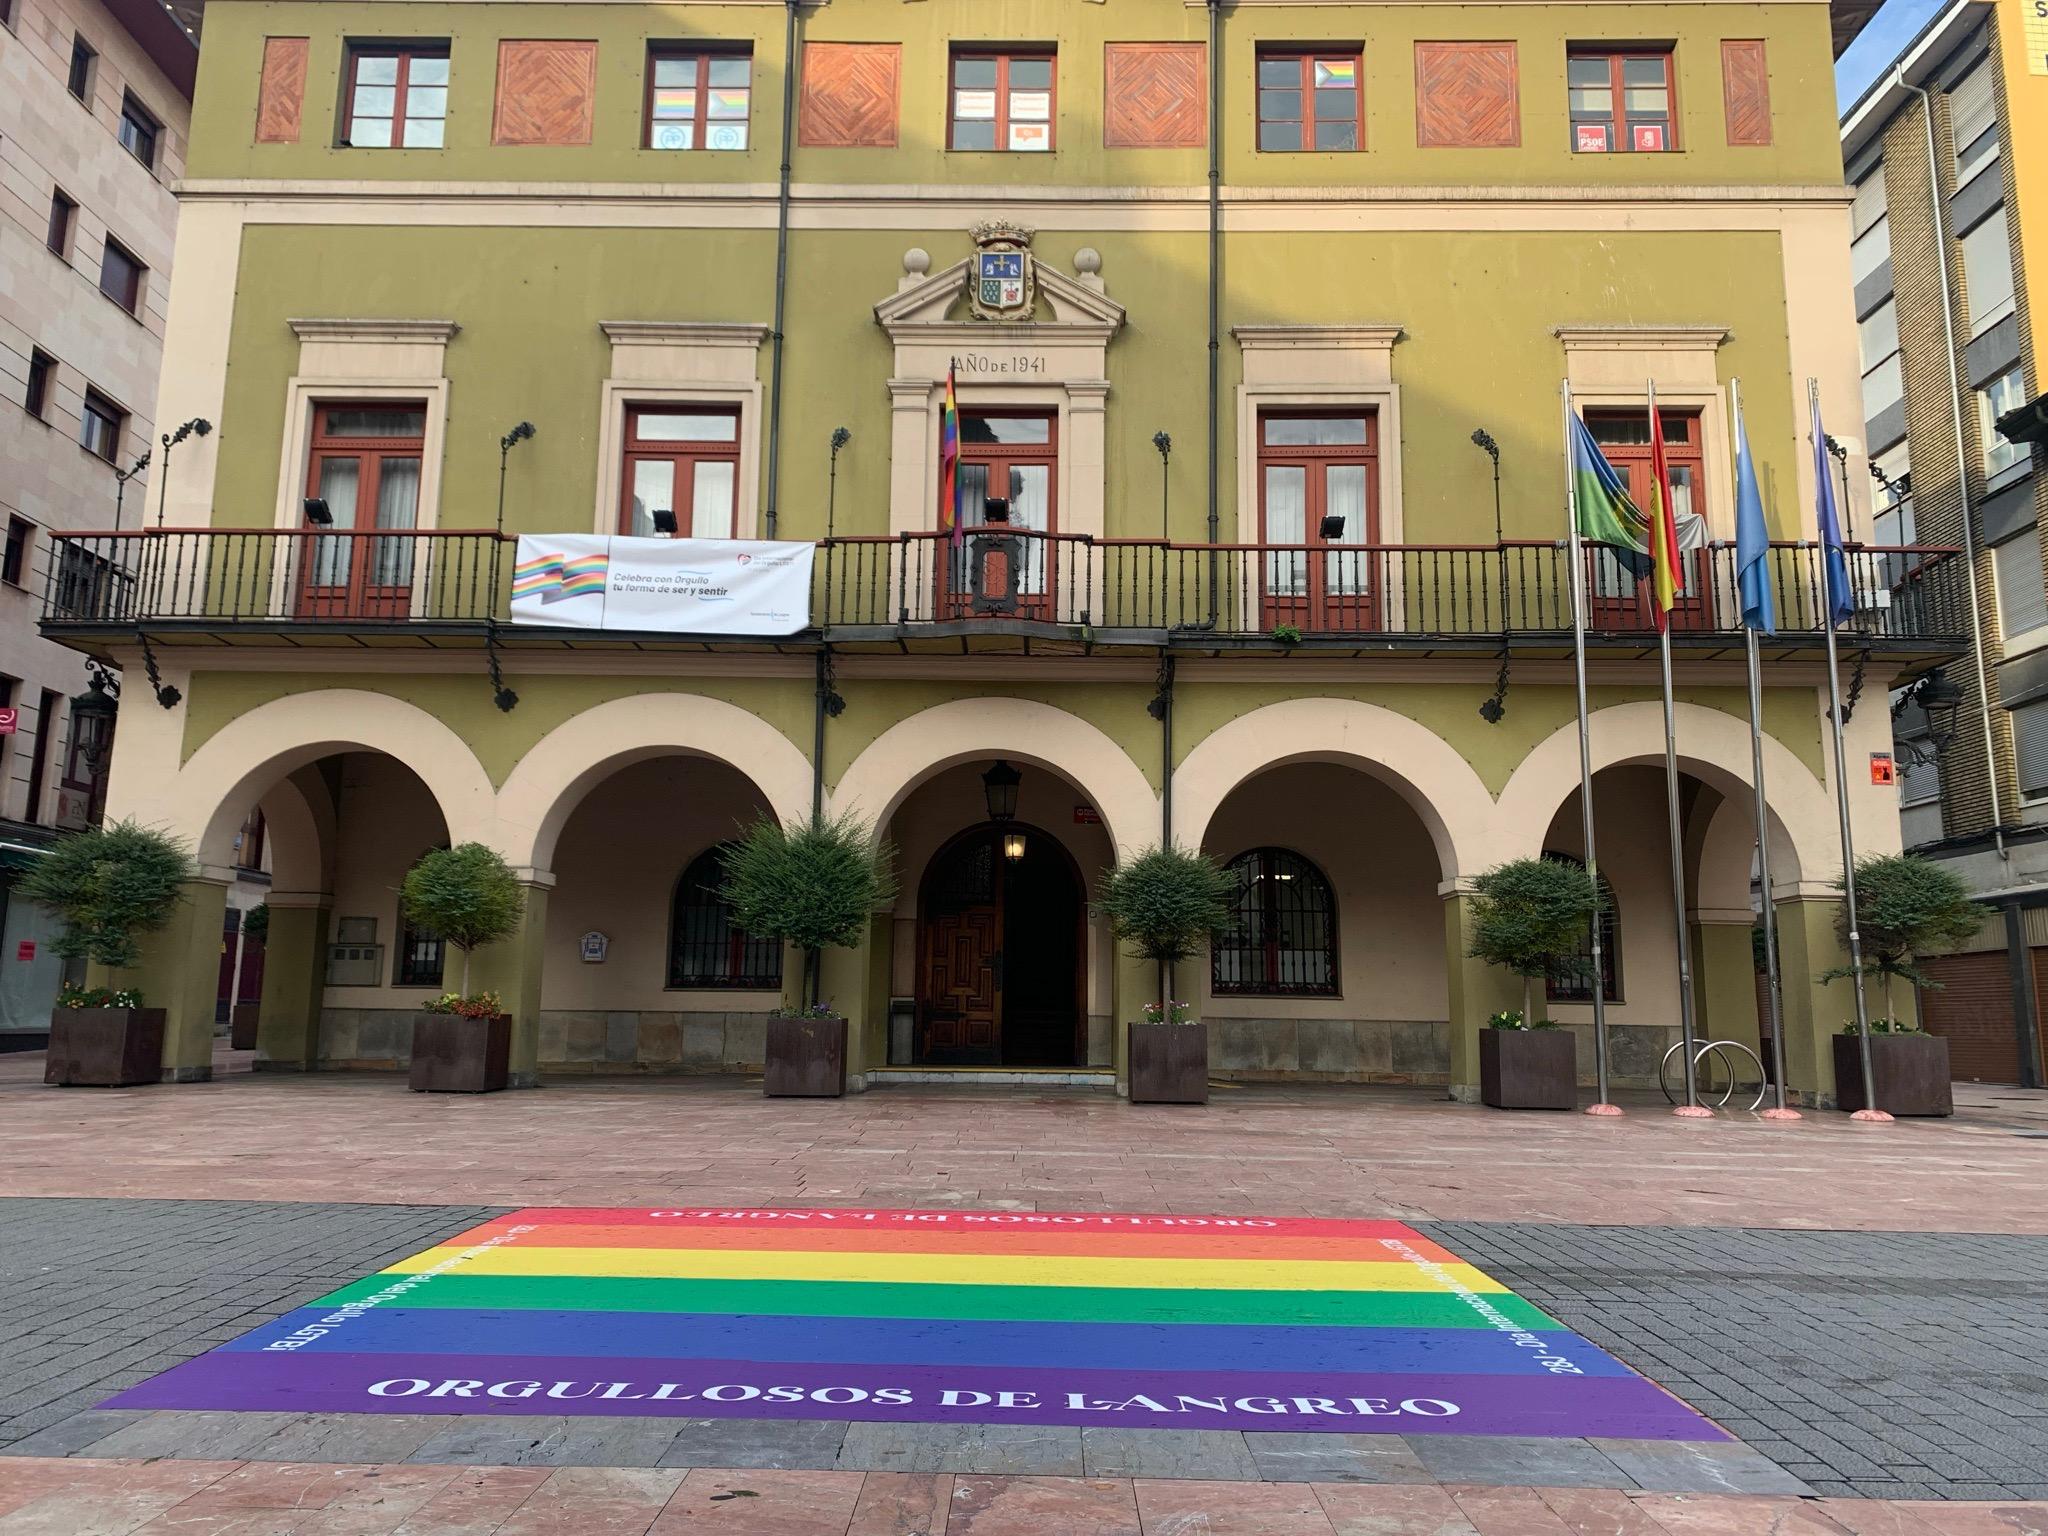 Ayuntamiento-langreo-orgullosos-langreo